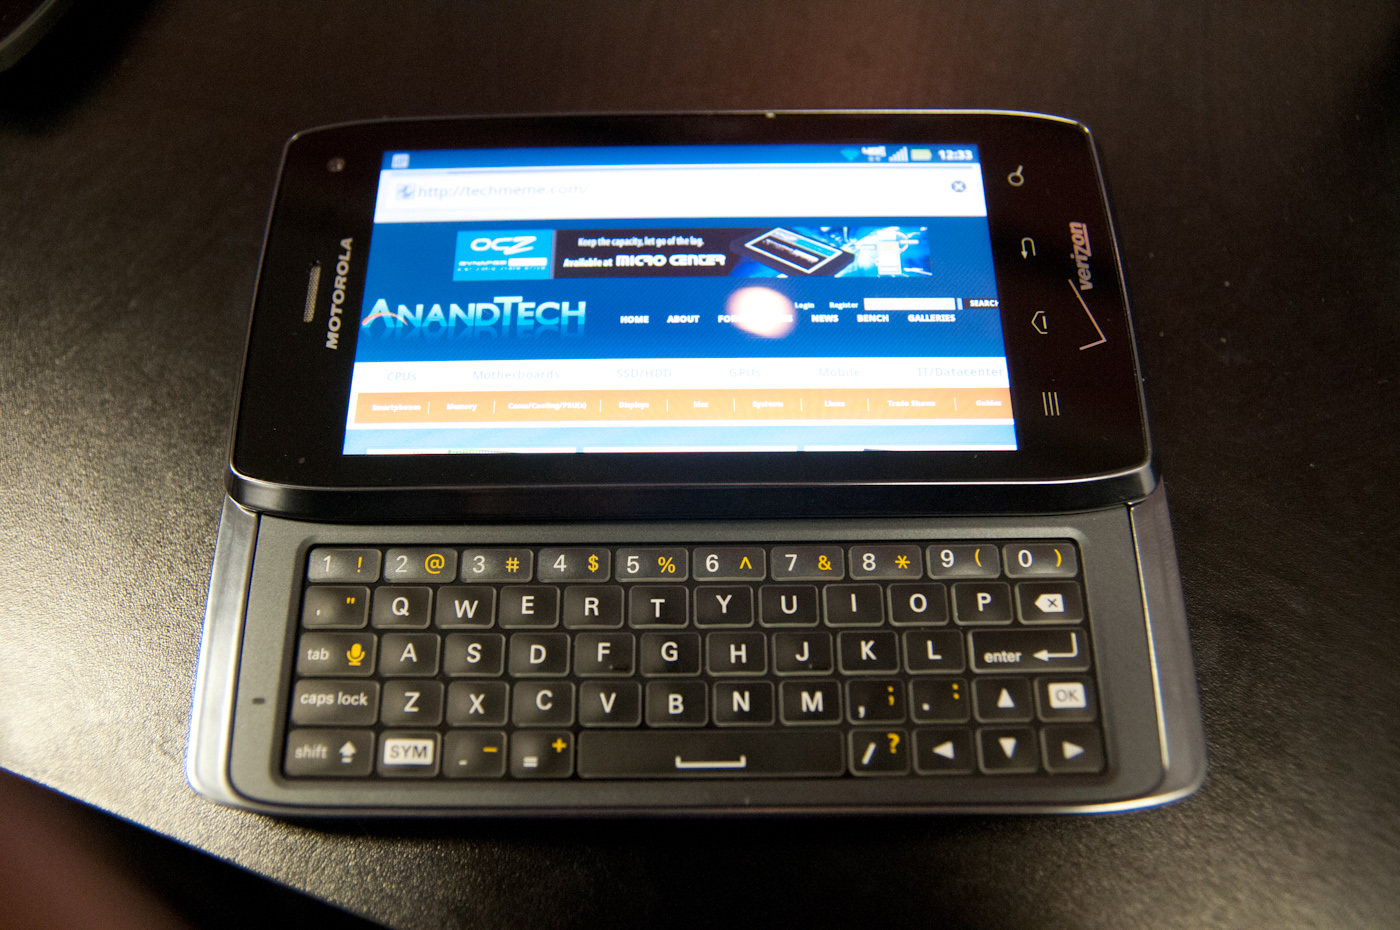 Motorola Droid RAZR MAXX, Droid 4, and Lapdock 500 Pro ...